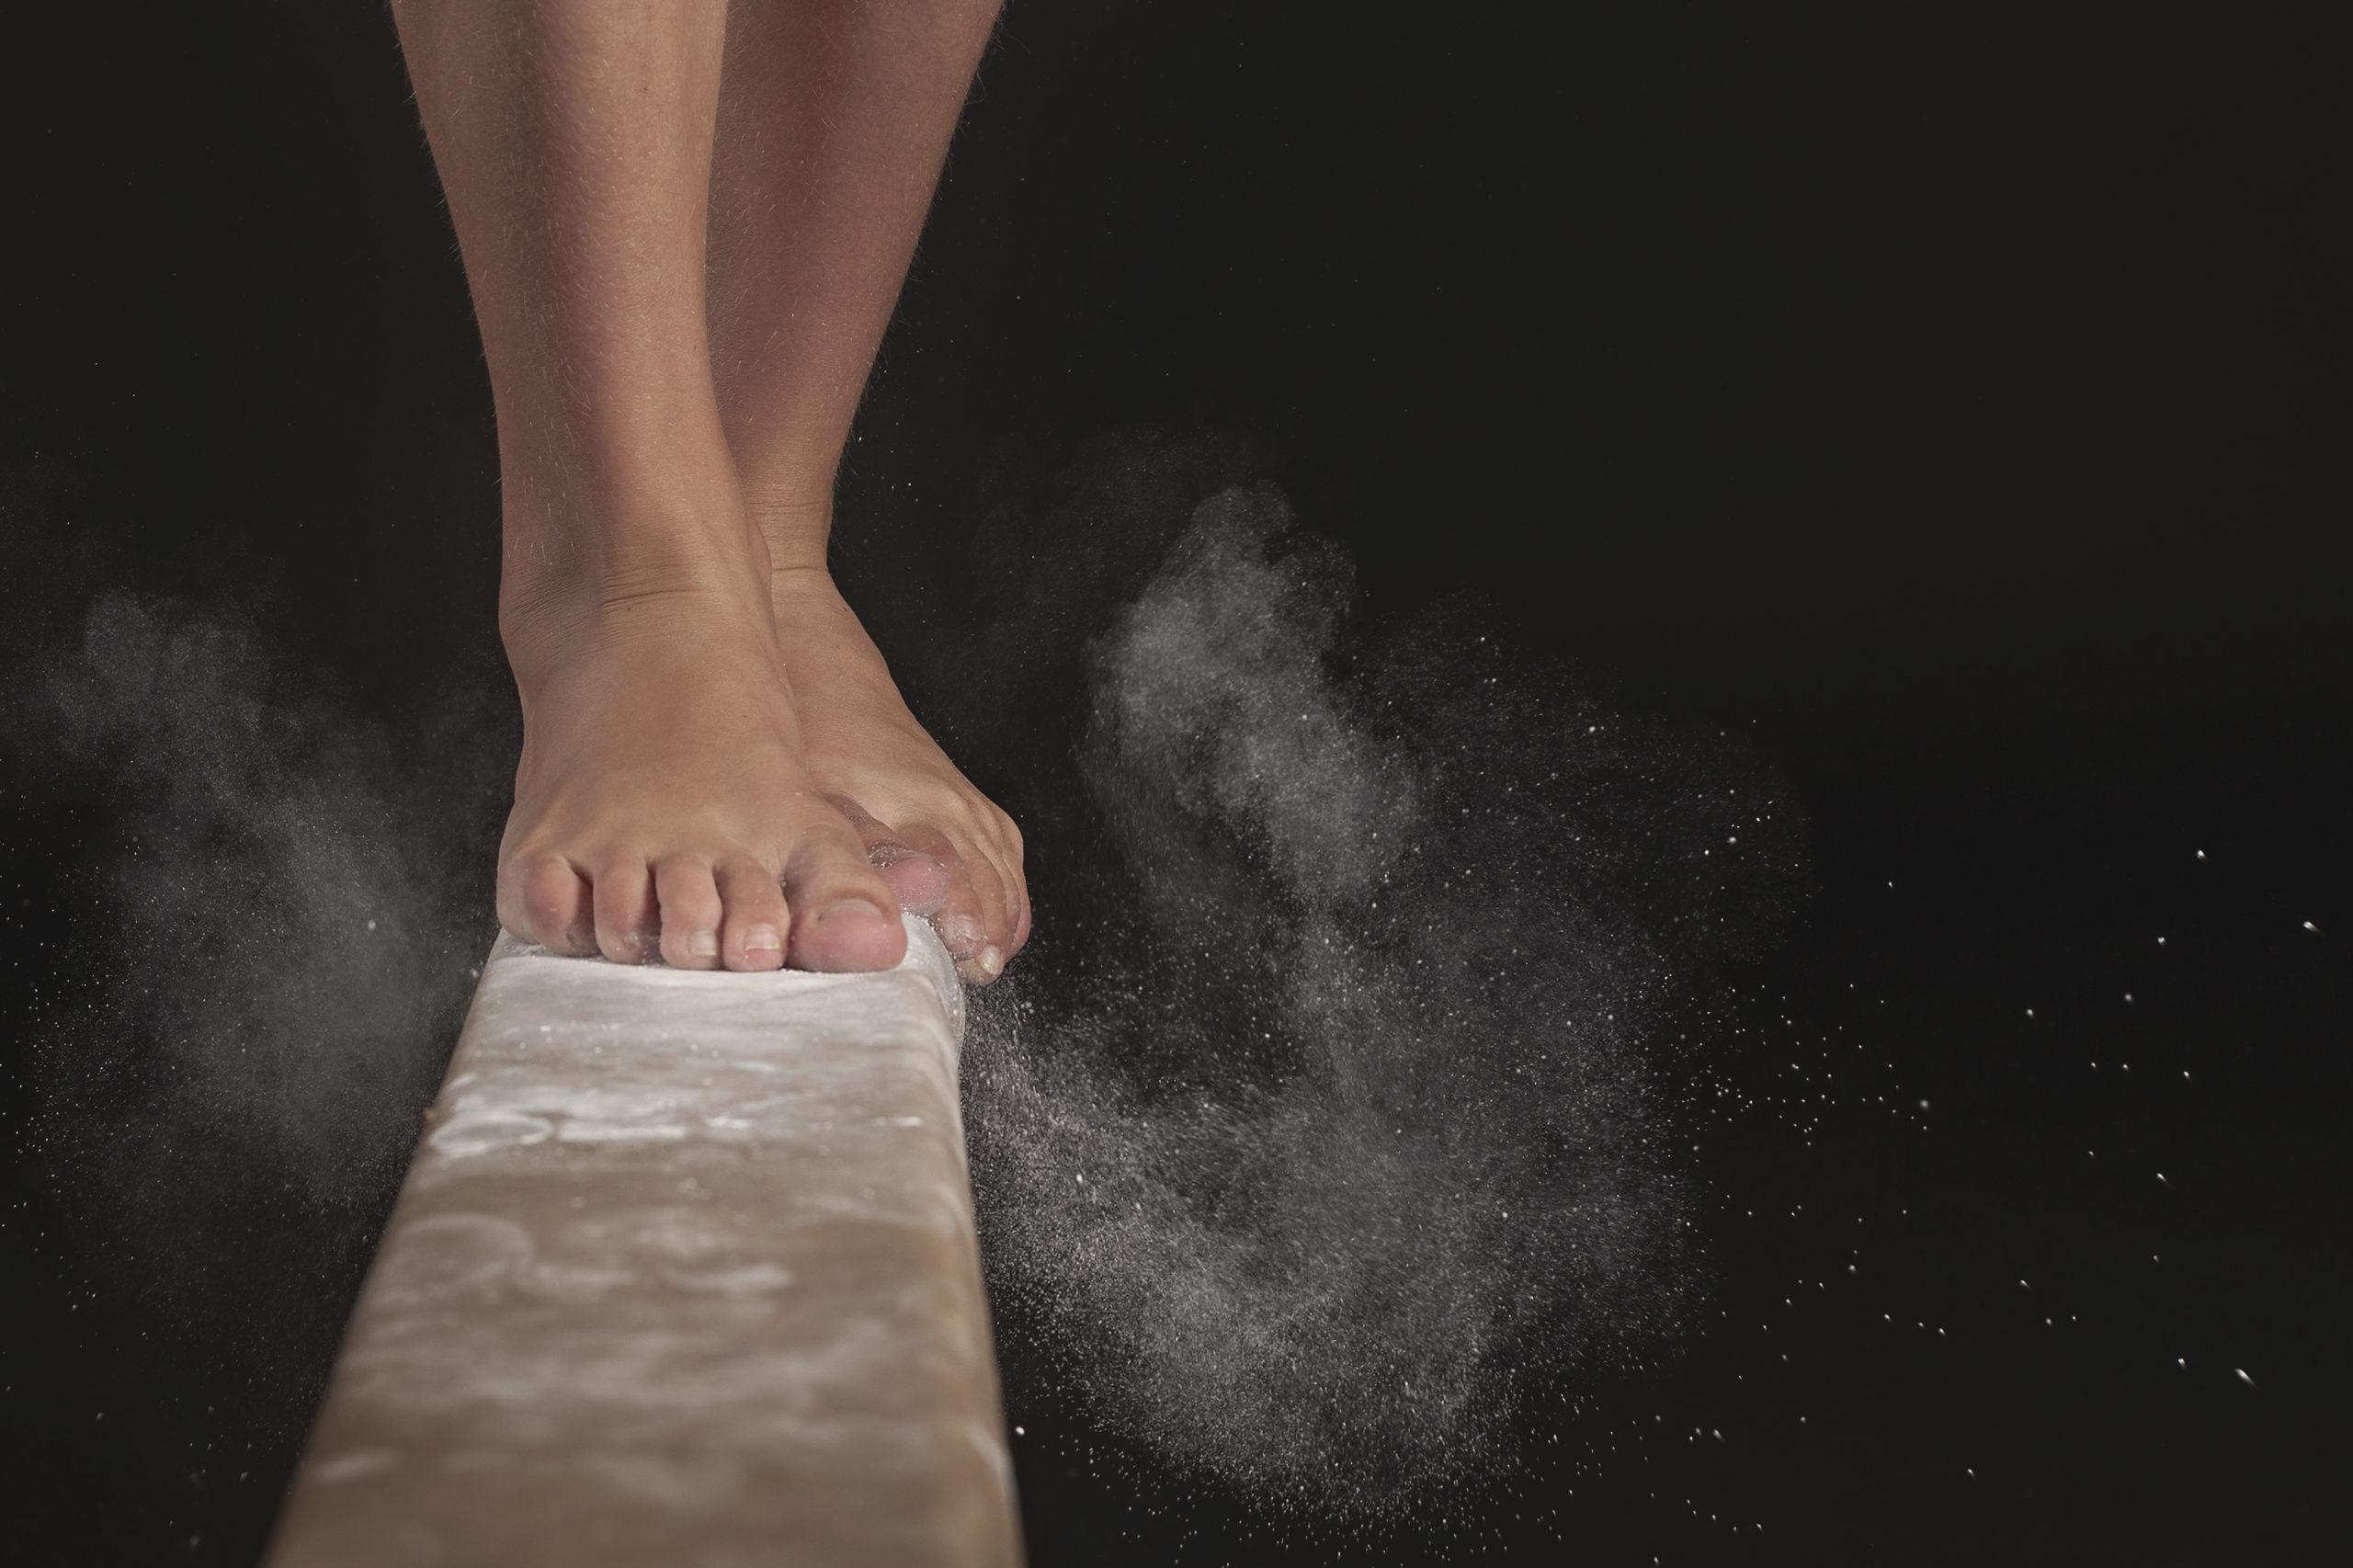 iStock, Athletes, action image of feet on balance beam